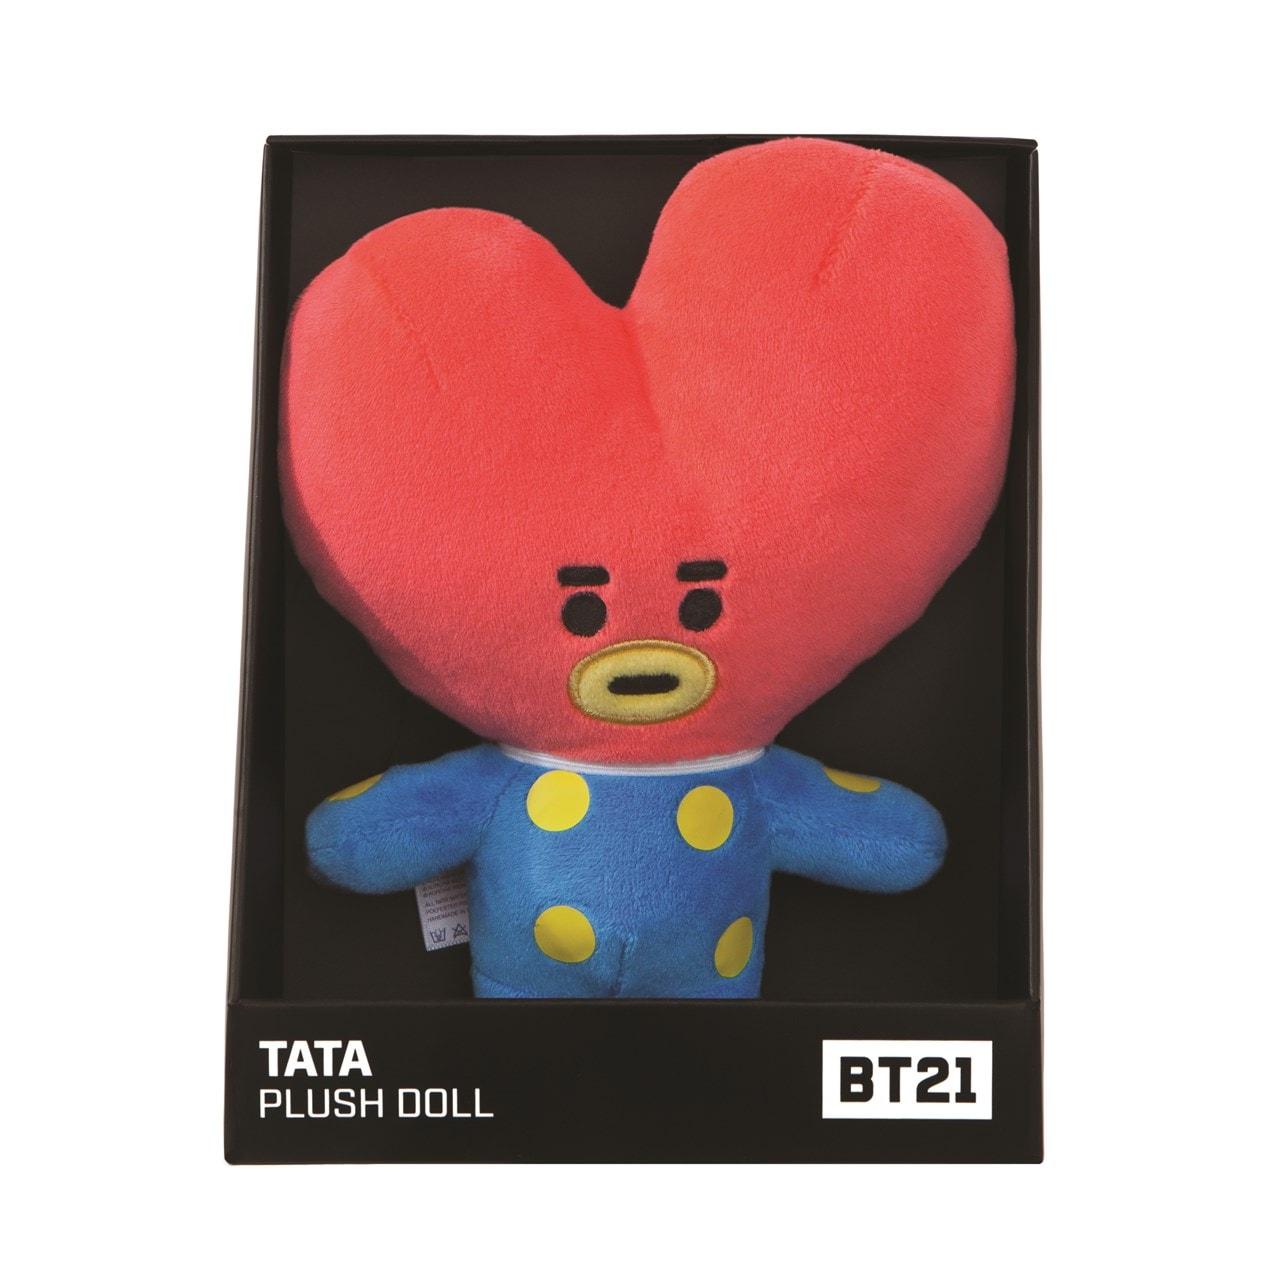 Tata: BT21 Small Plush - 1